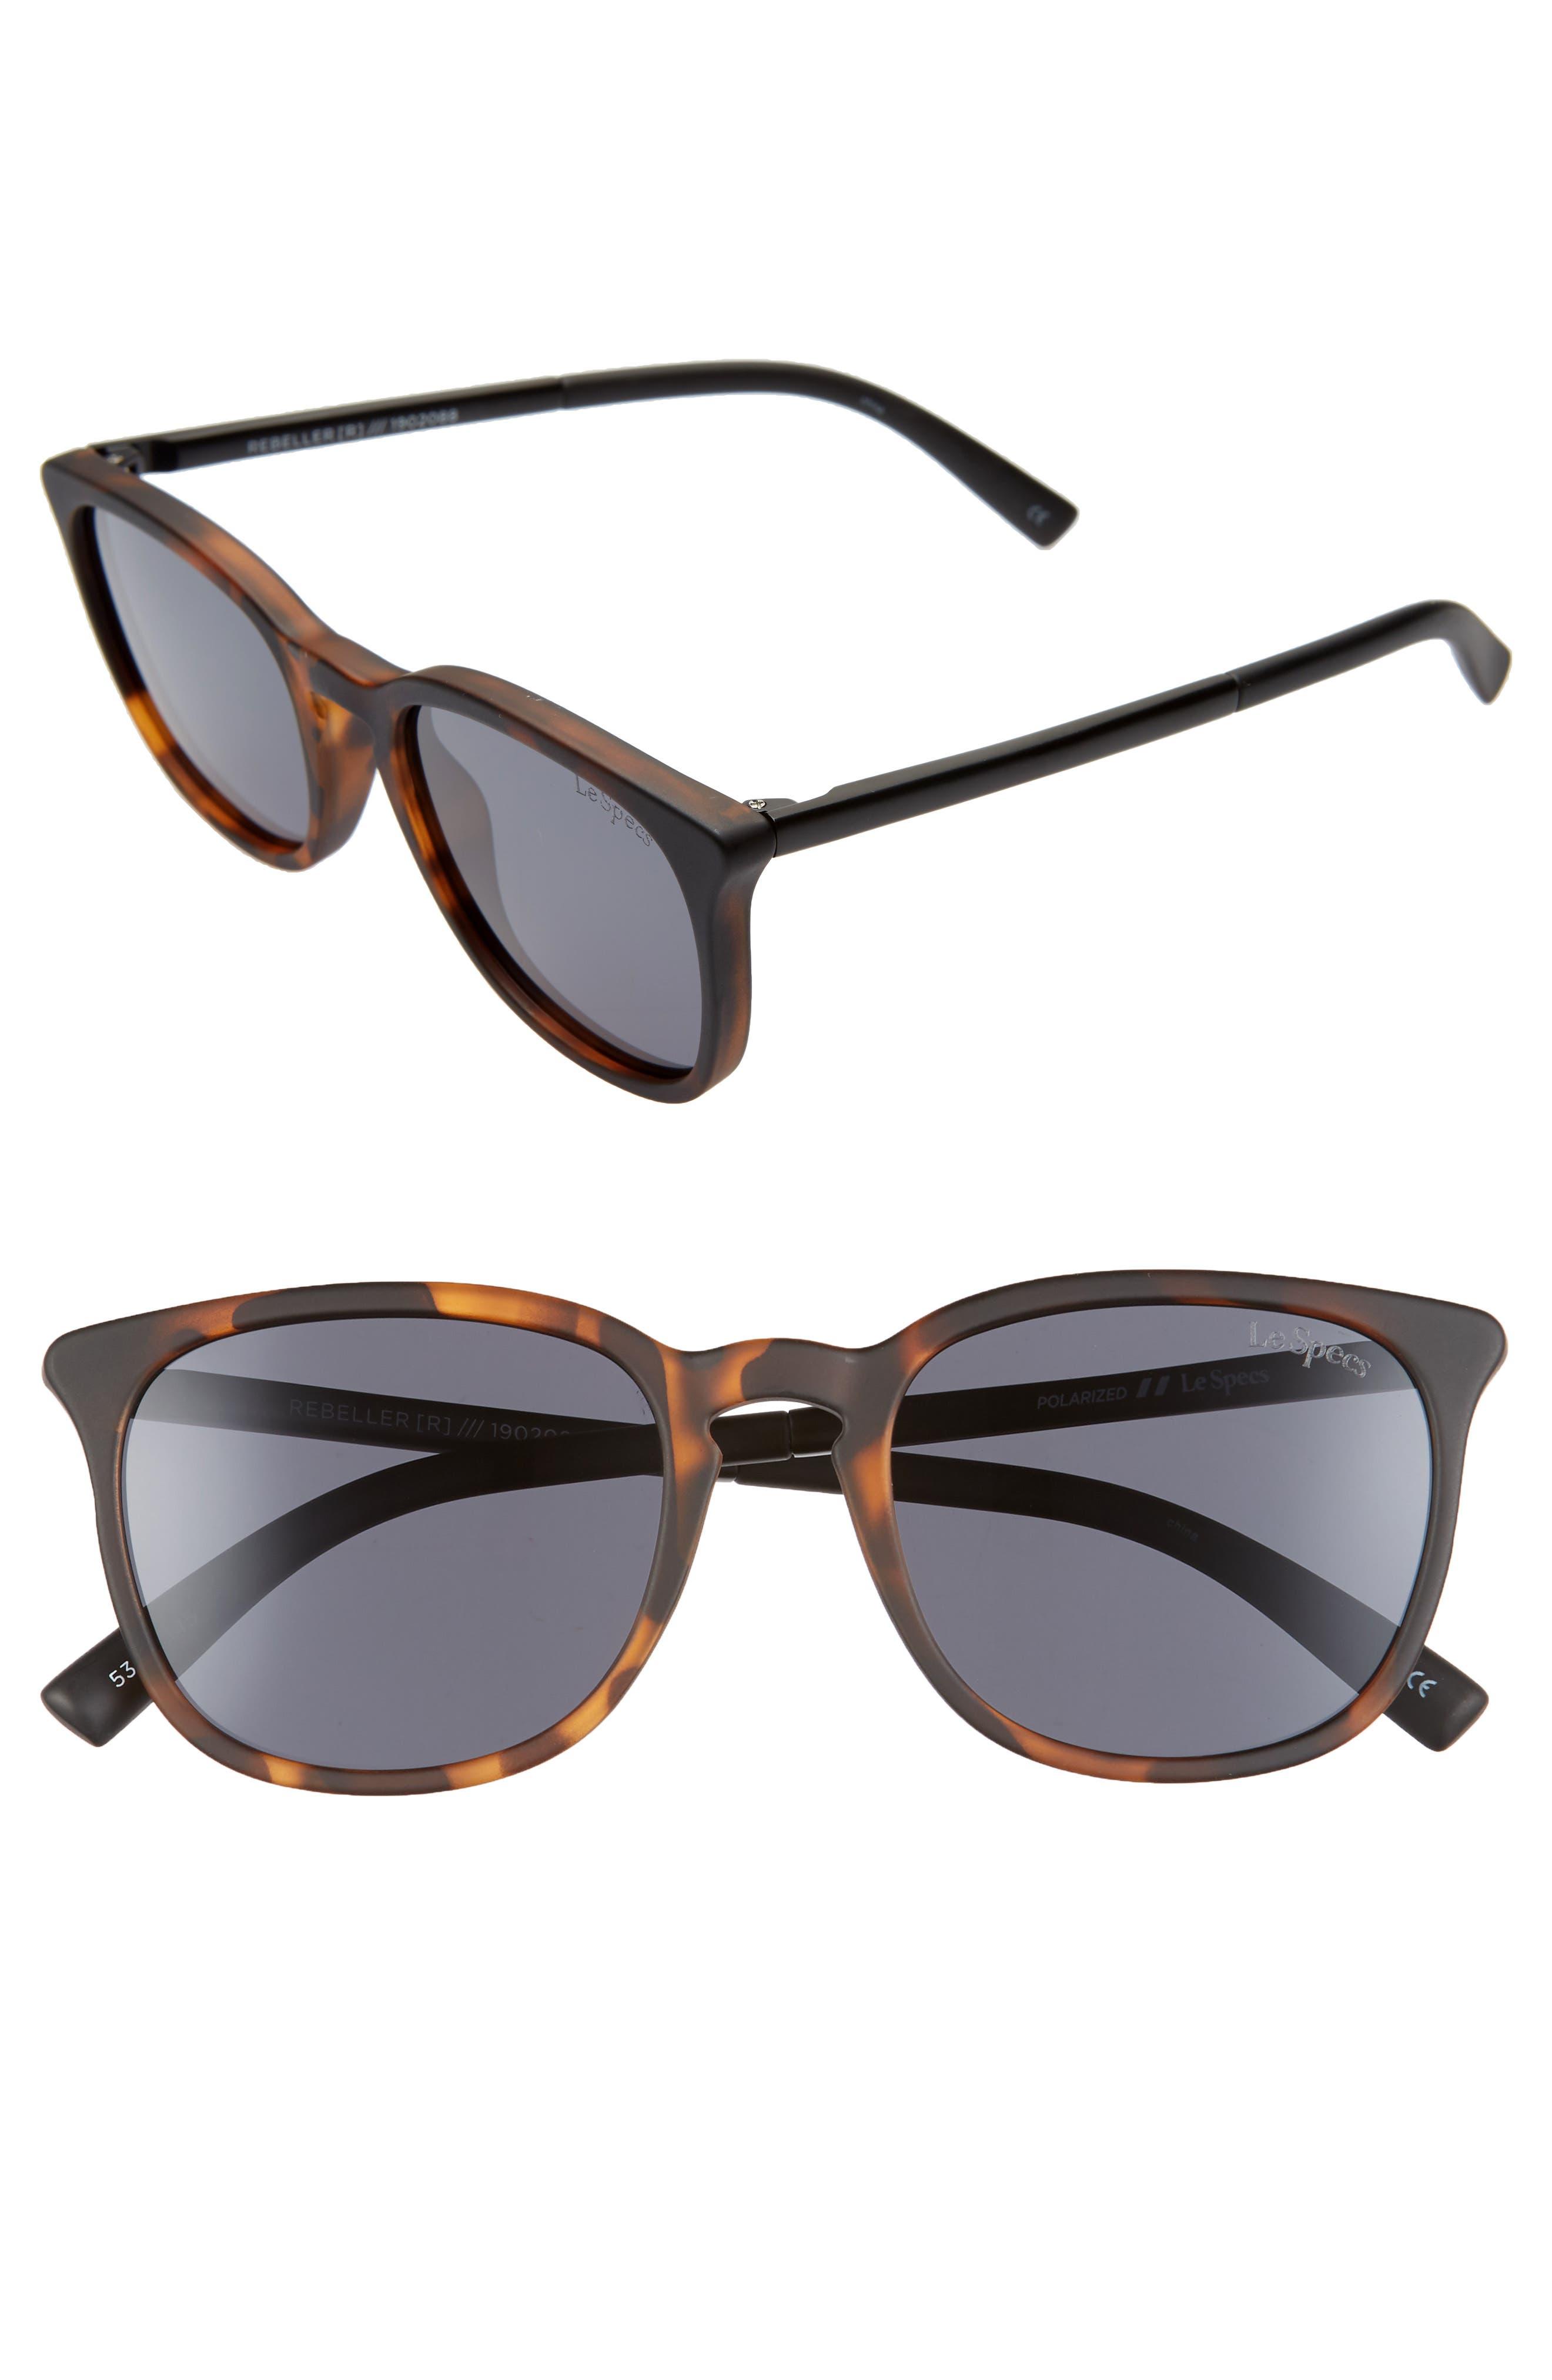 Le Specs Rebeller 5m Sunglasses - Matte Tortoise/ Smoke